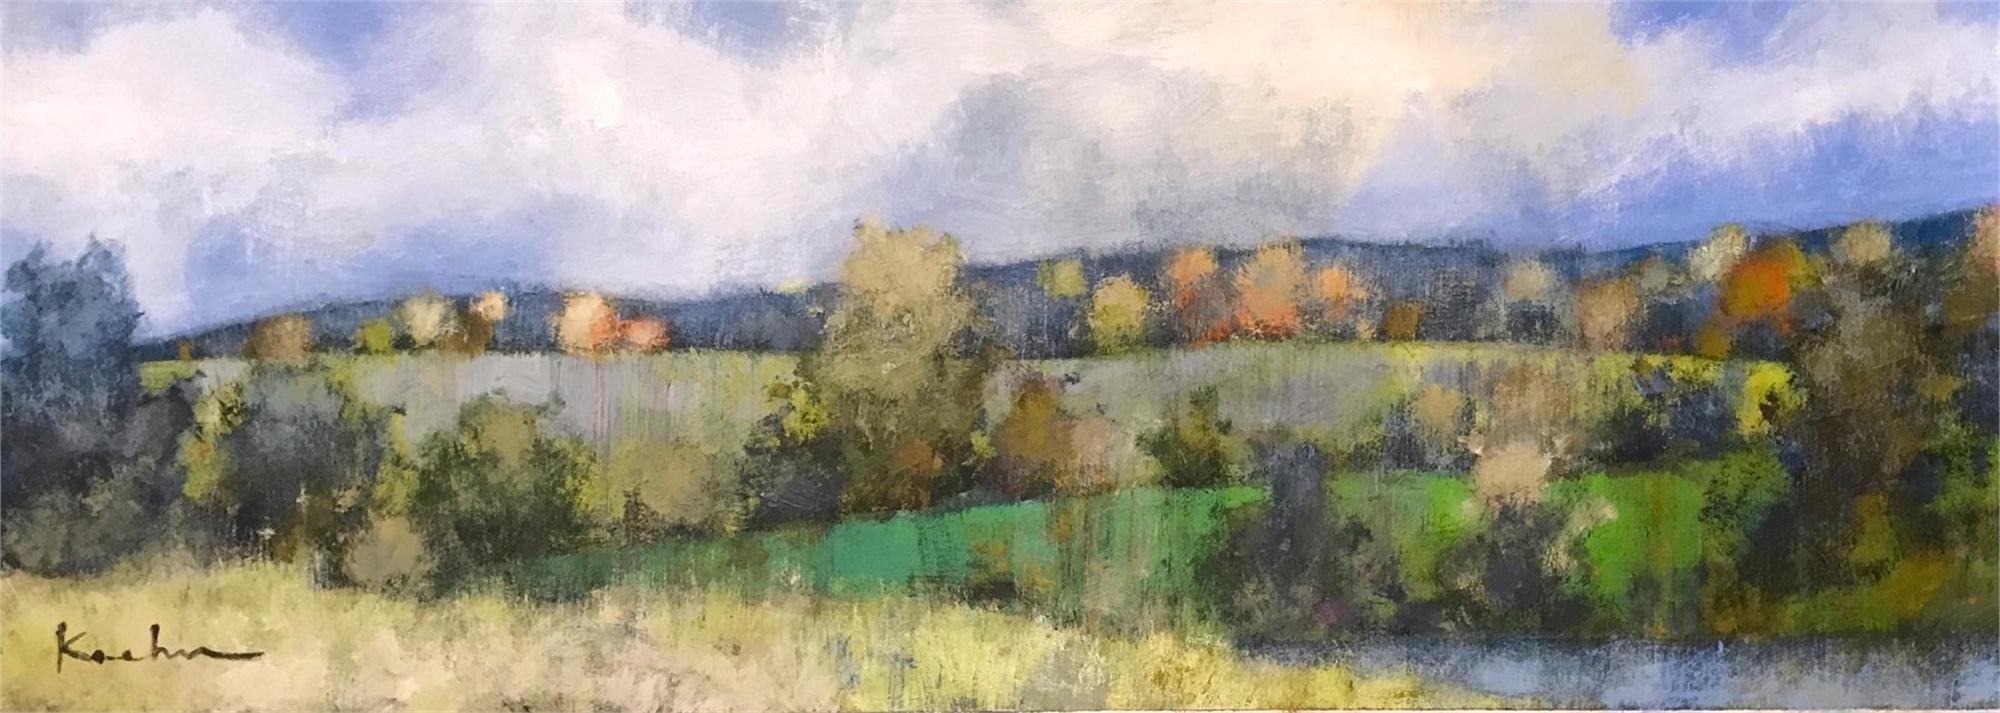 Shifting Seasons by Jeff Koehn